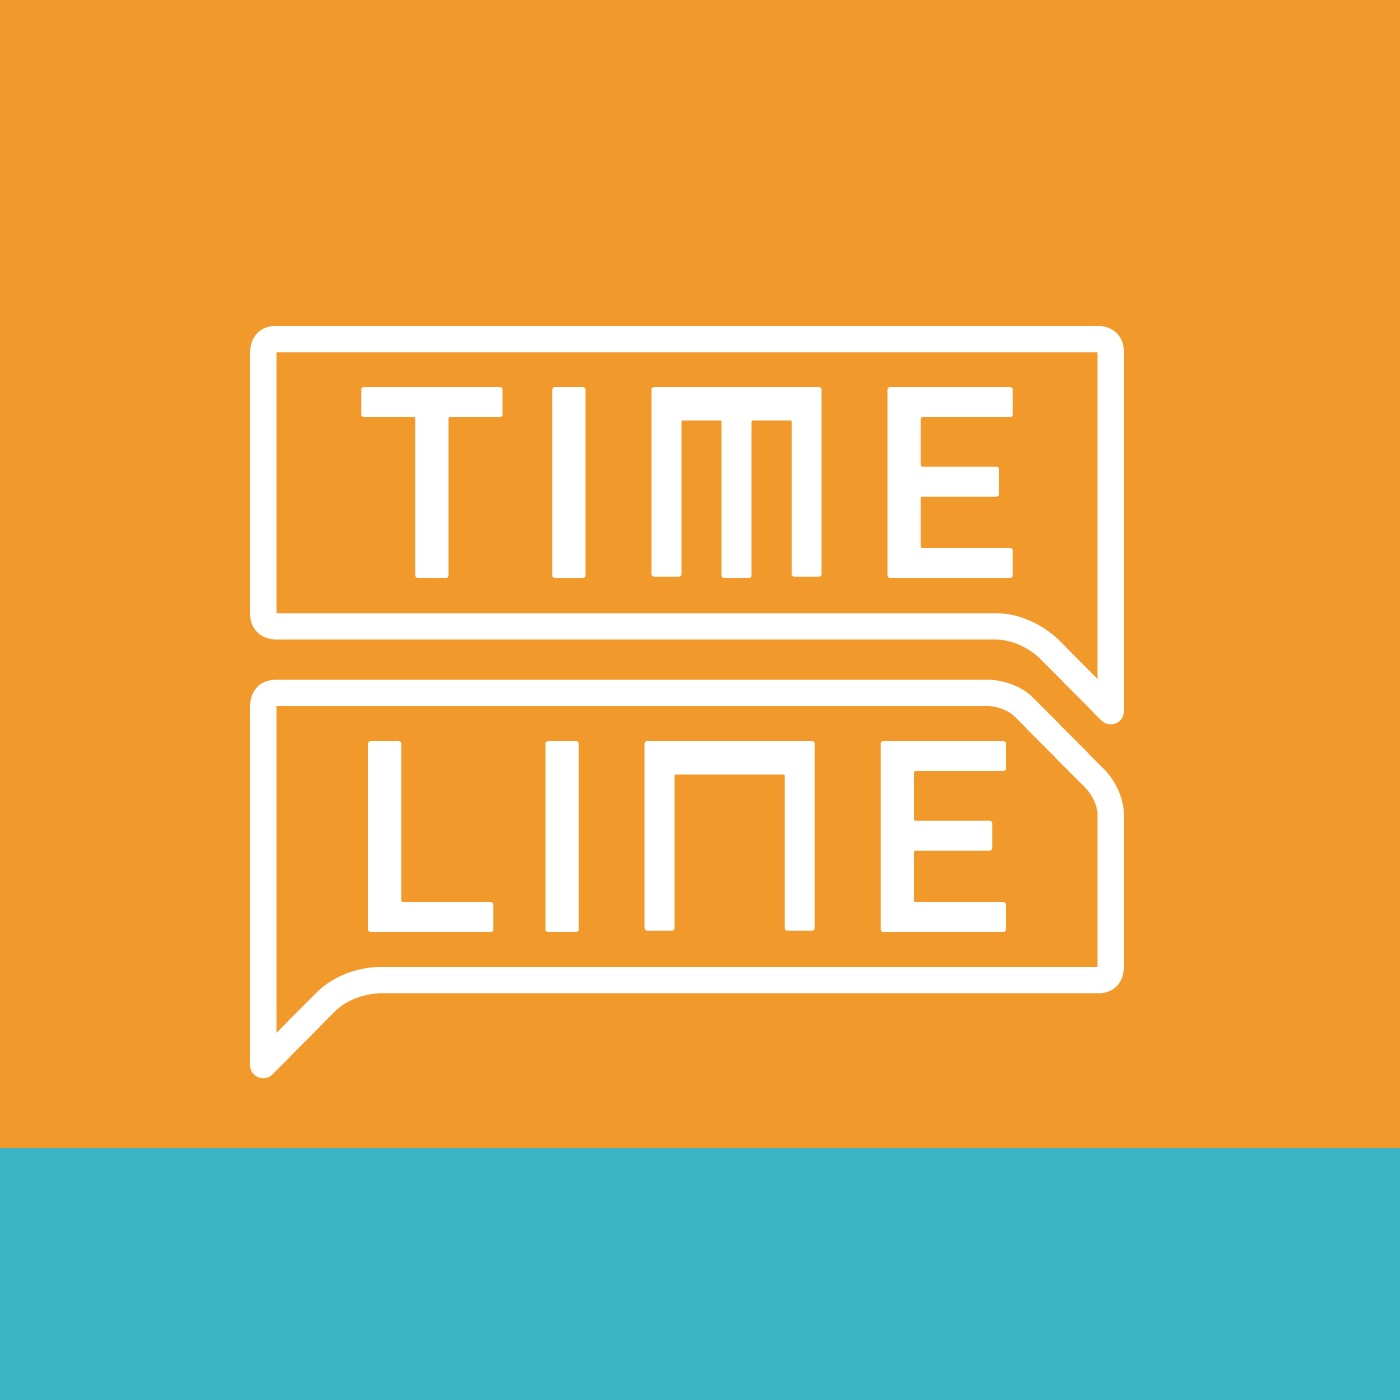 Timeline Gaúcha 27/04/2017